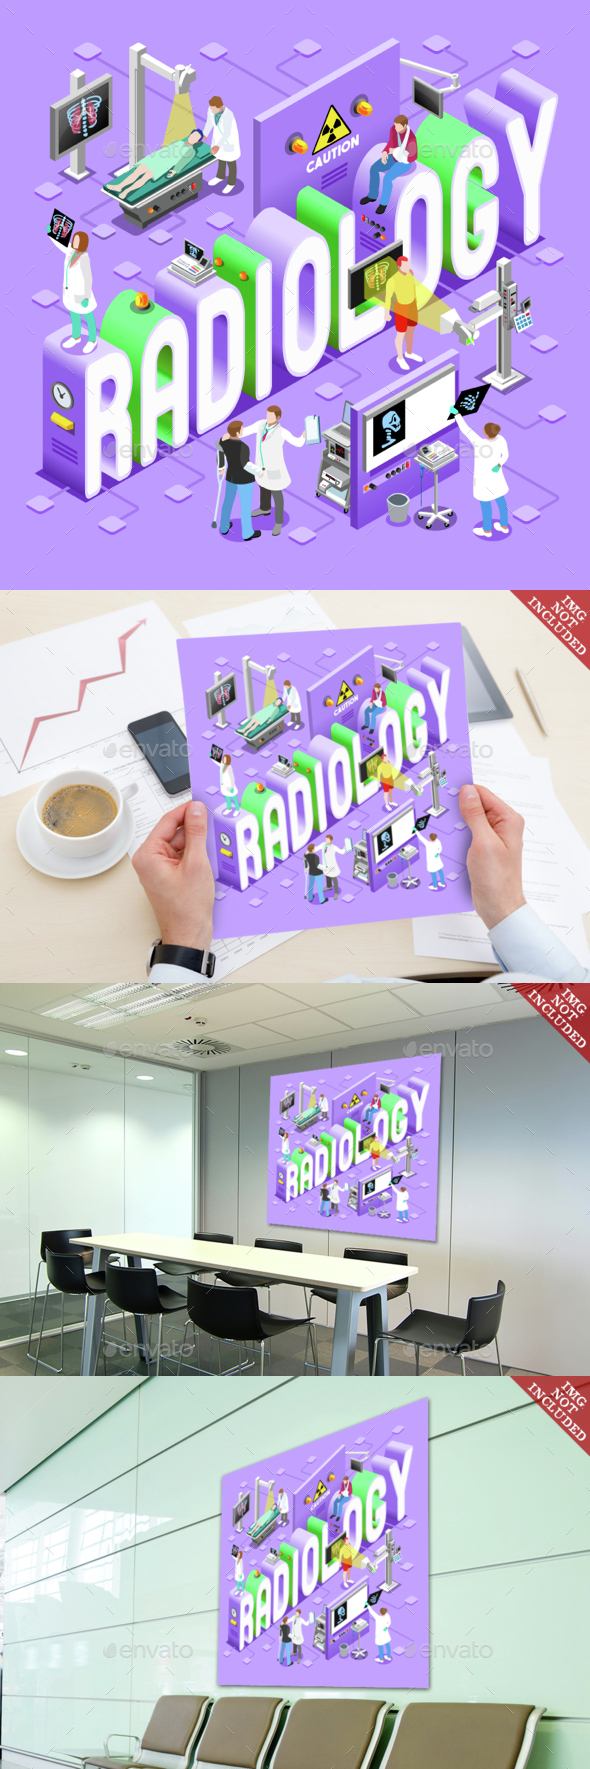 Radiology 01 Concept Isometric - Health/Medicine Conceptual